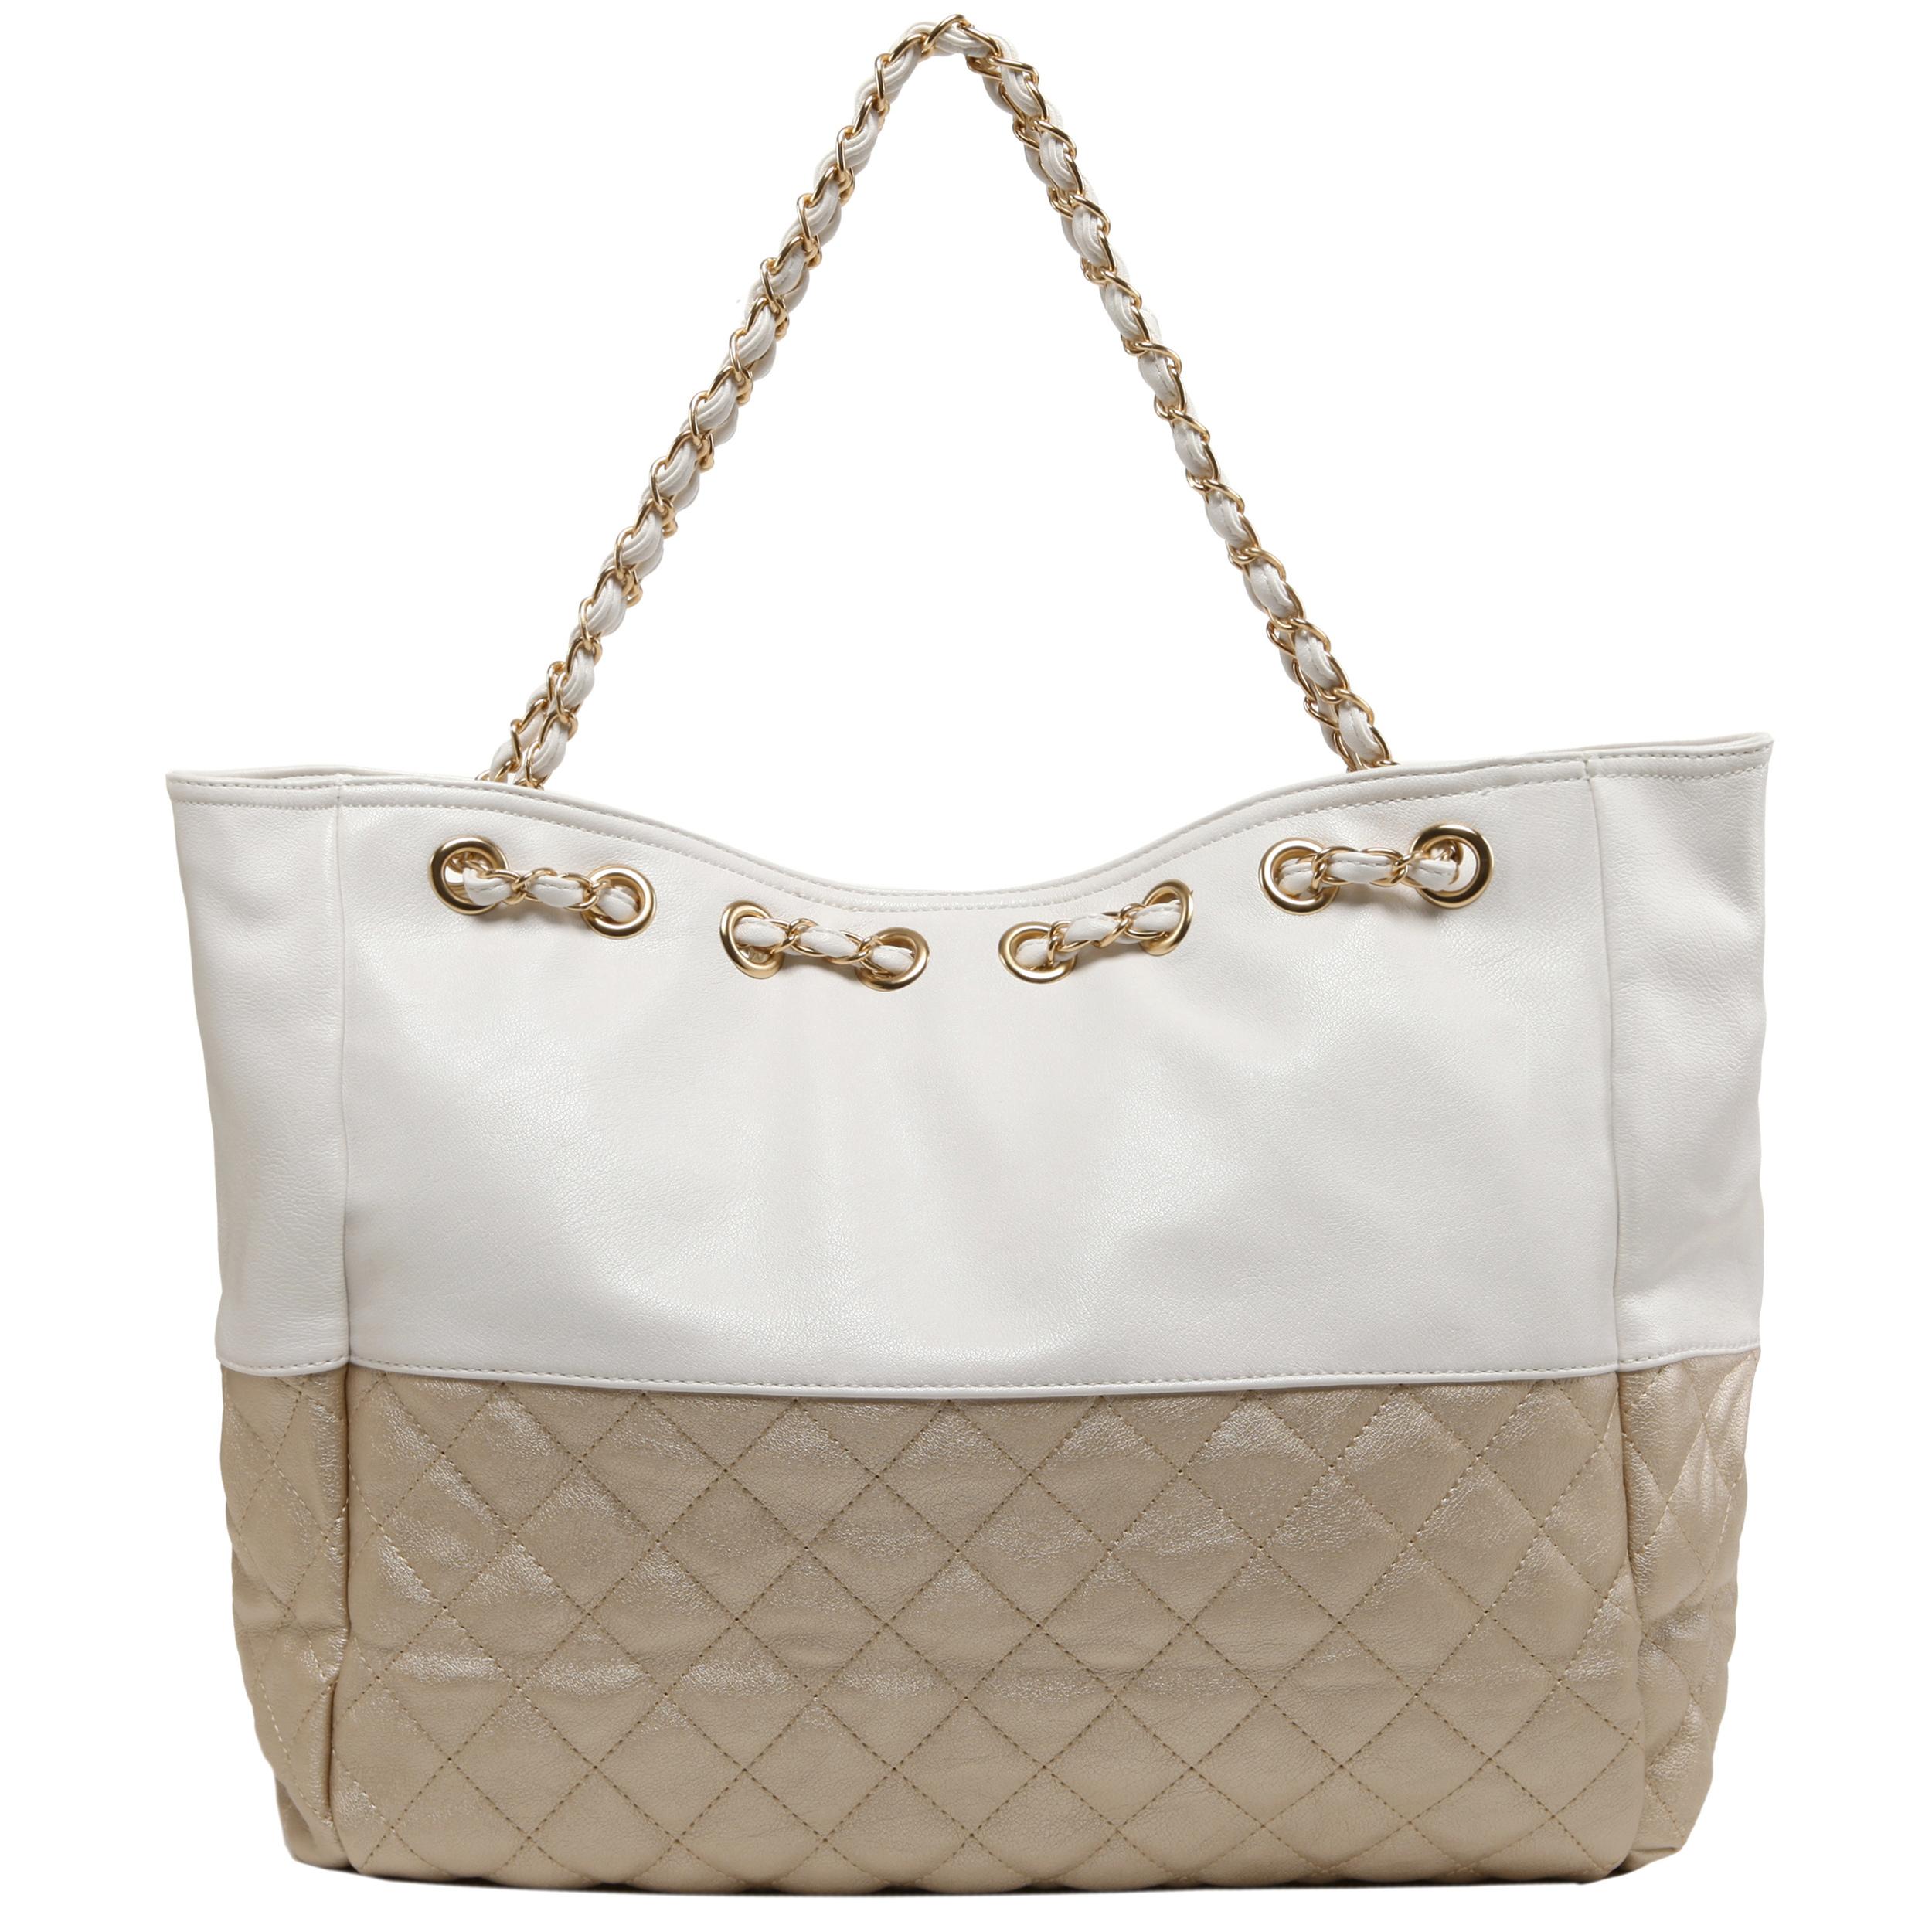 mg-collection-camryn-shoulder-tote-handbag-tb-h0172gol-4.jpg